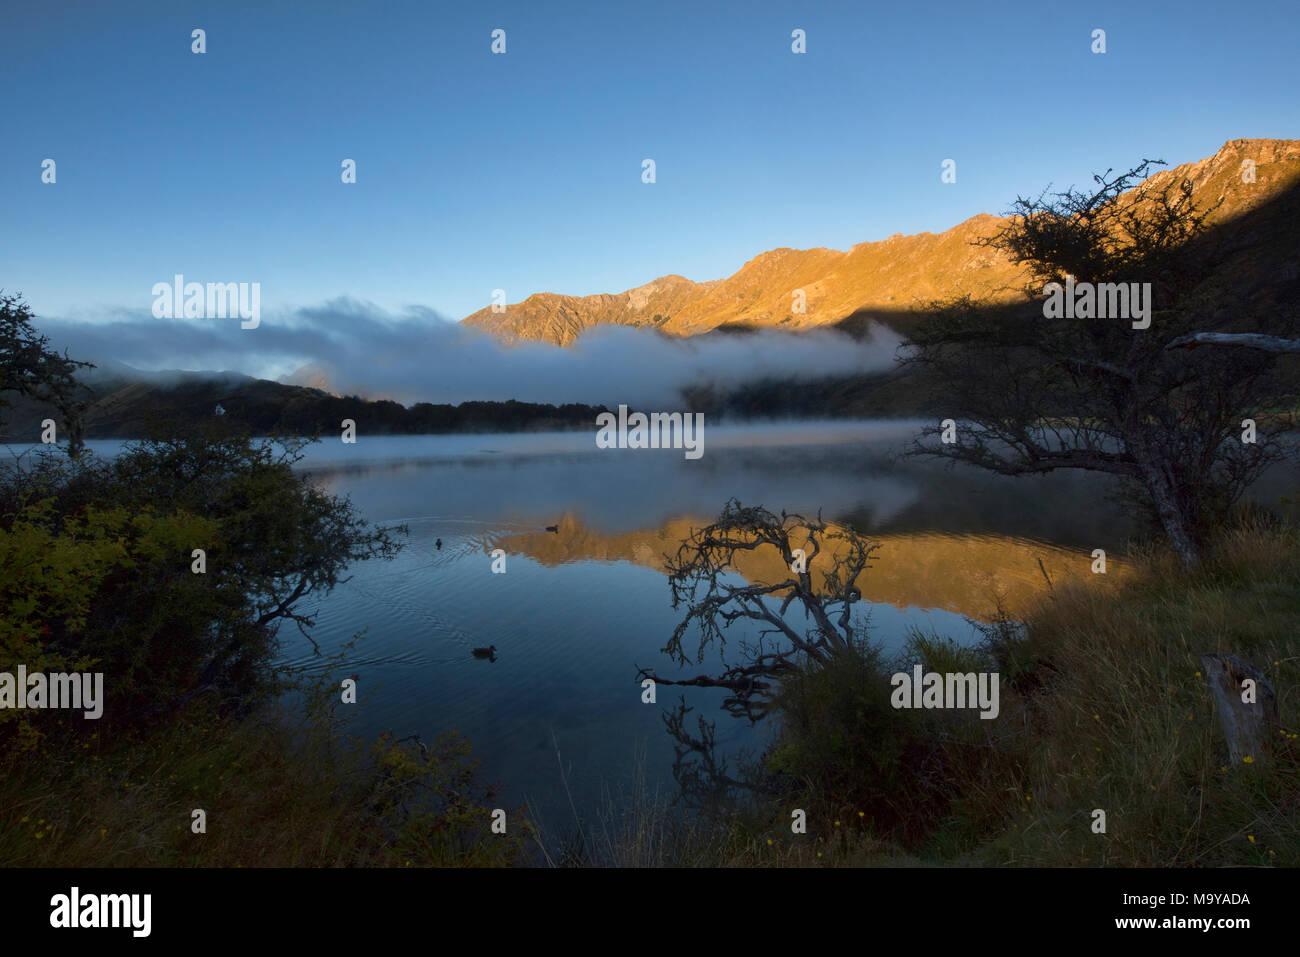 Morning mist on Moke Lake near Queenstown, New Zealand - Stock Image